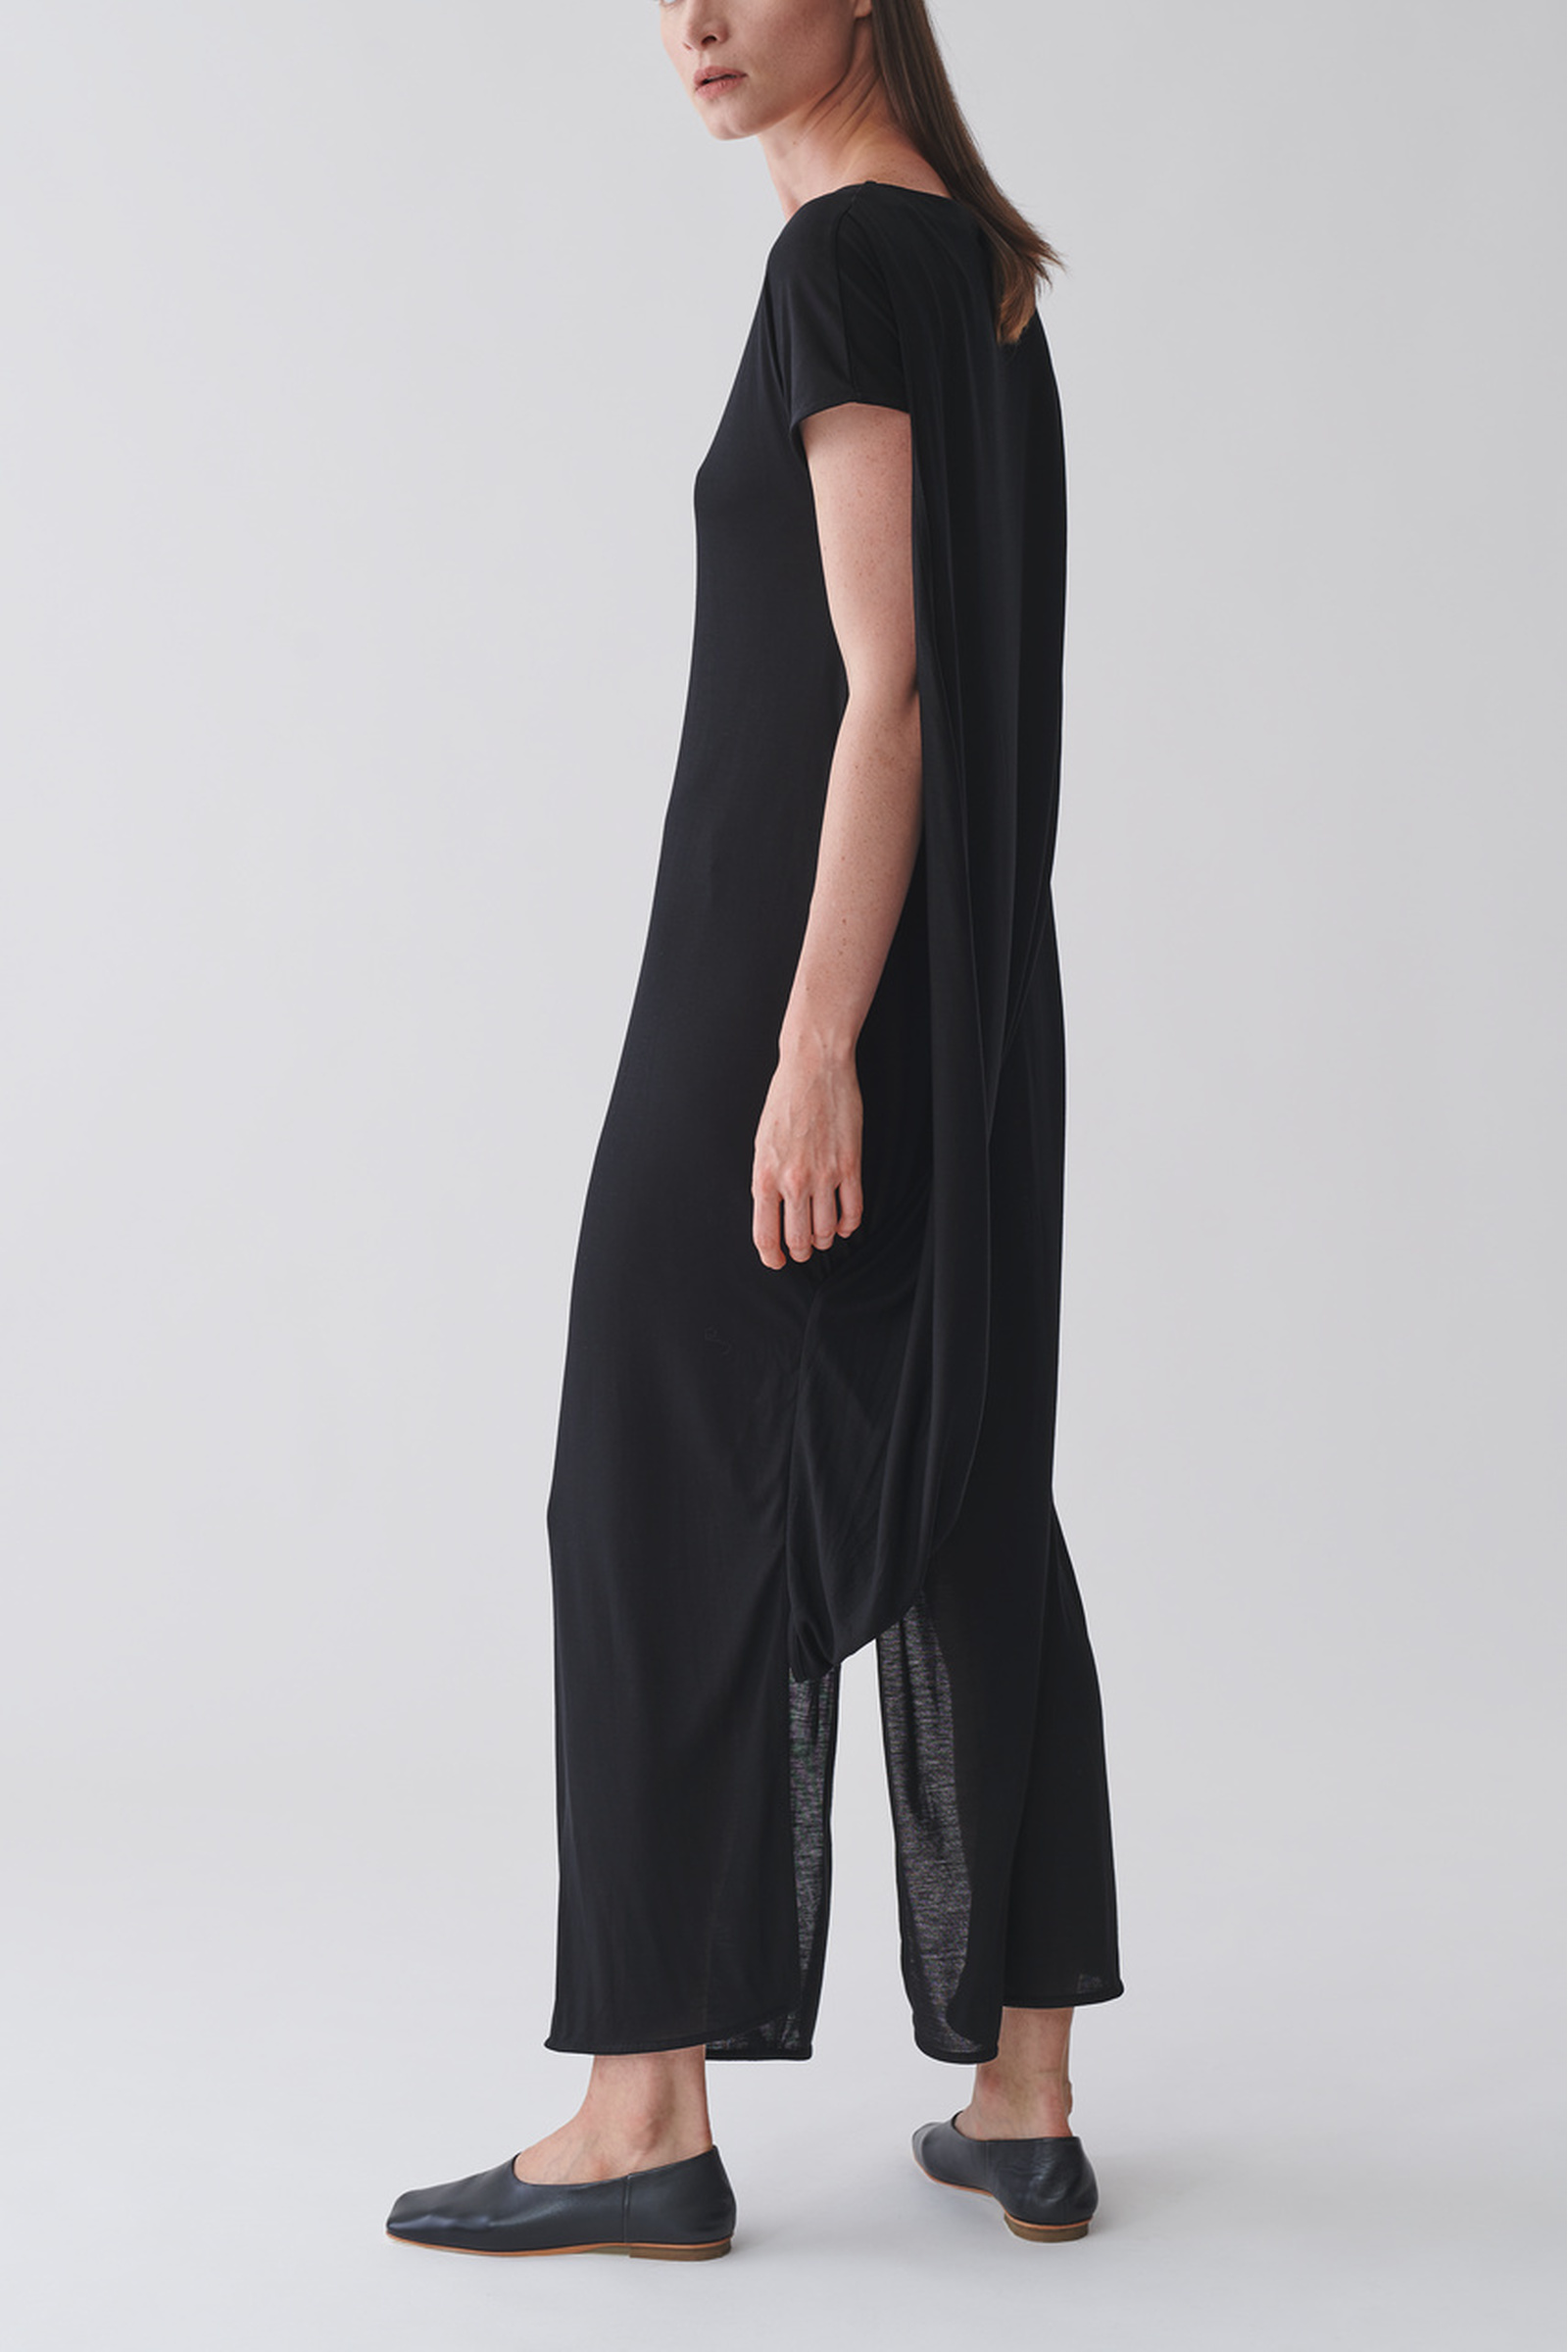 COS 롱 드레이프드 드레스의 블랙컬러 ECOMLook입니다.